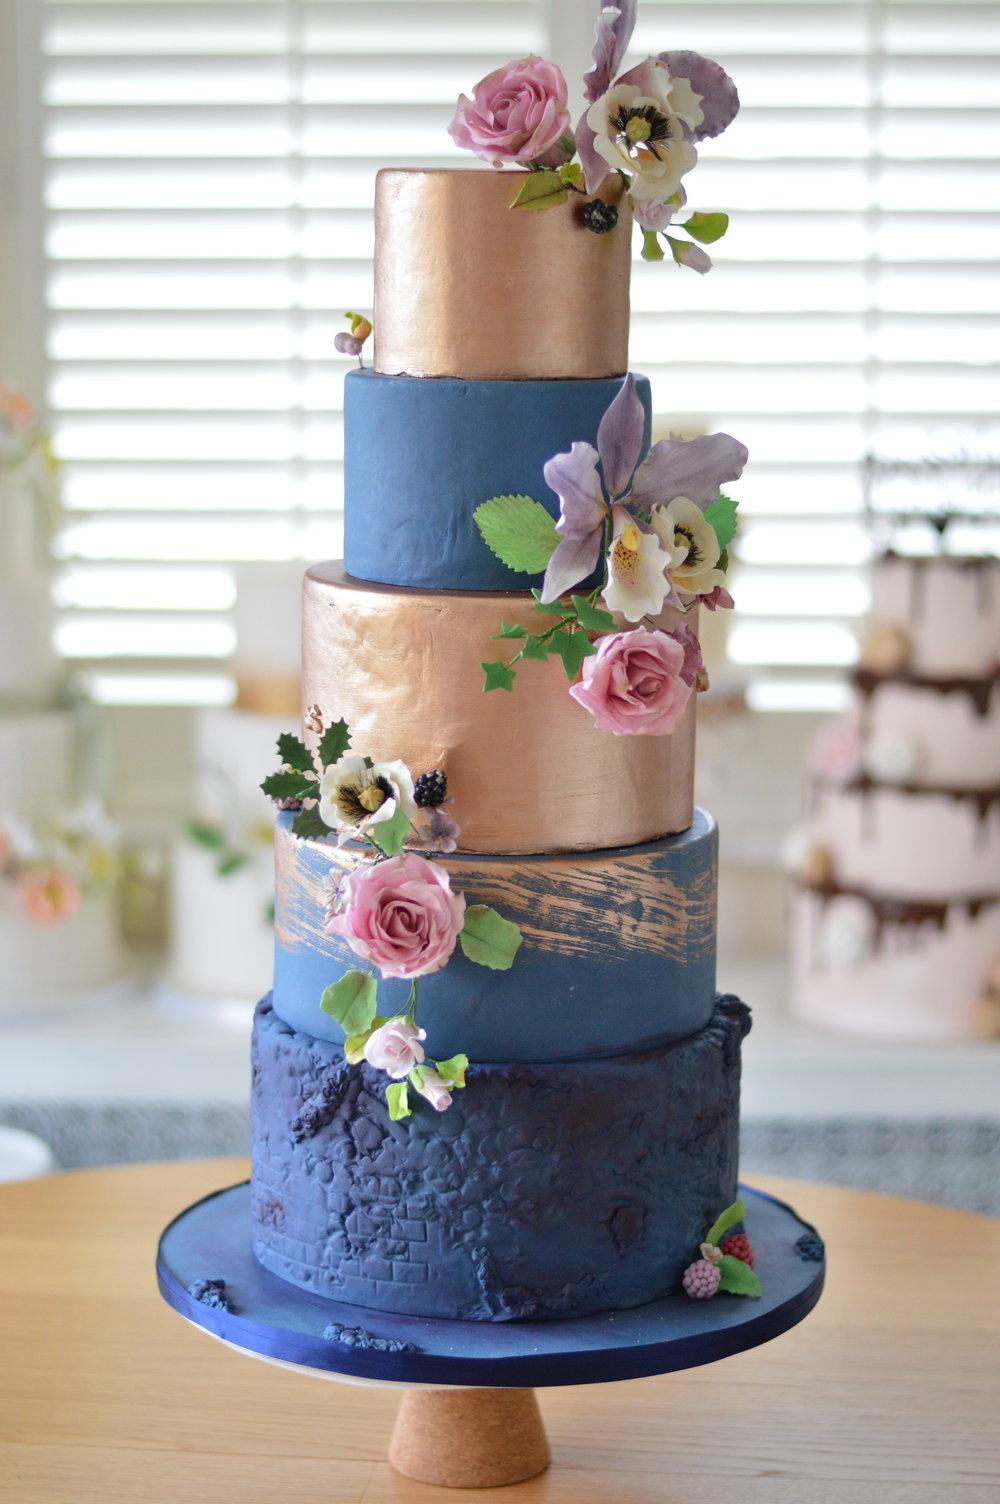 The secret garden wedding cake